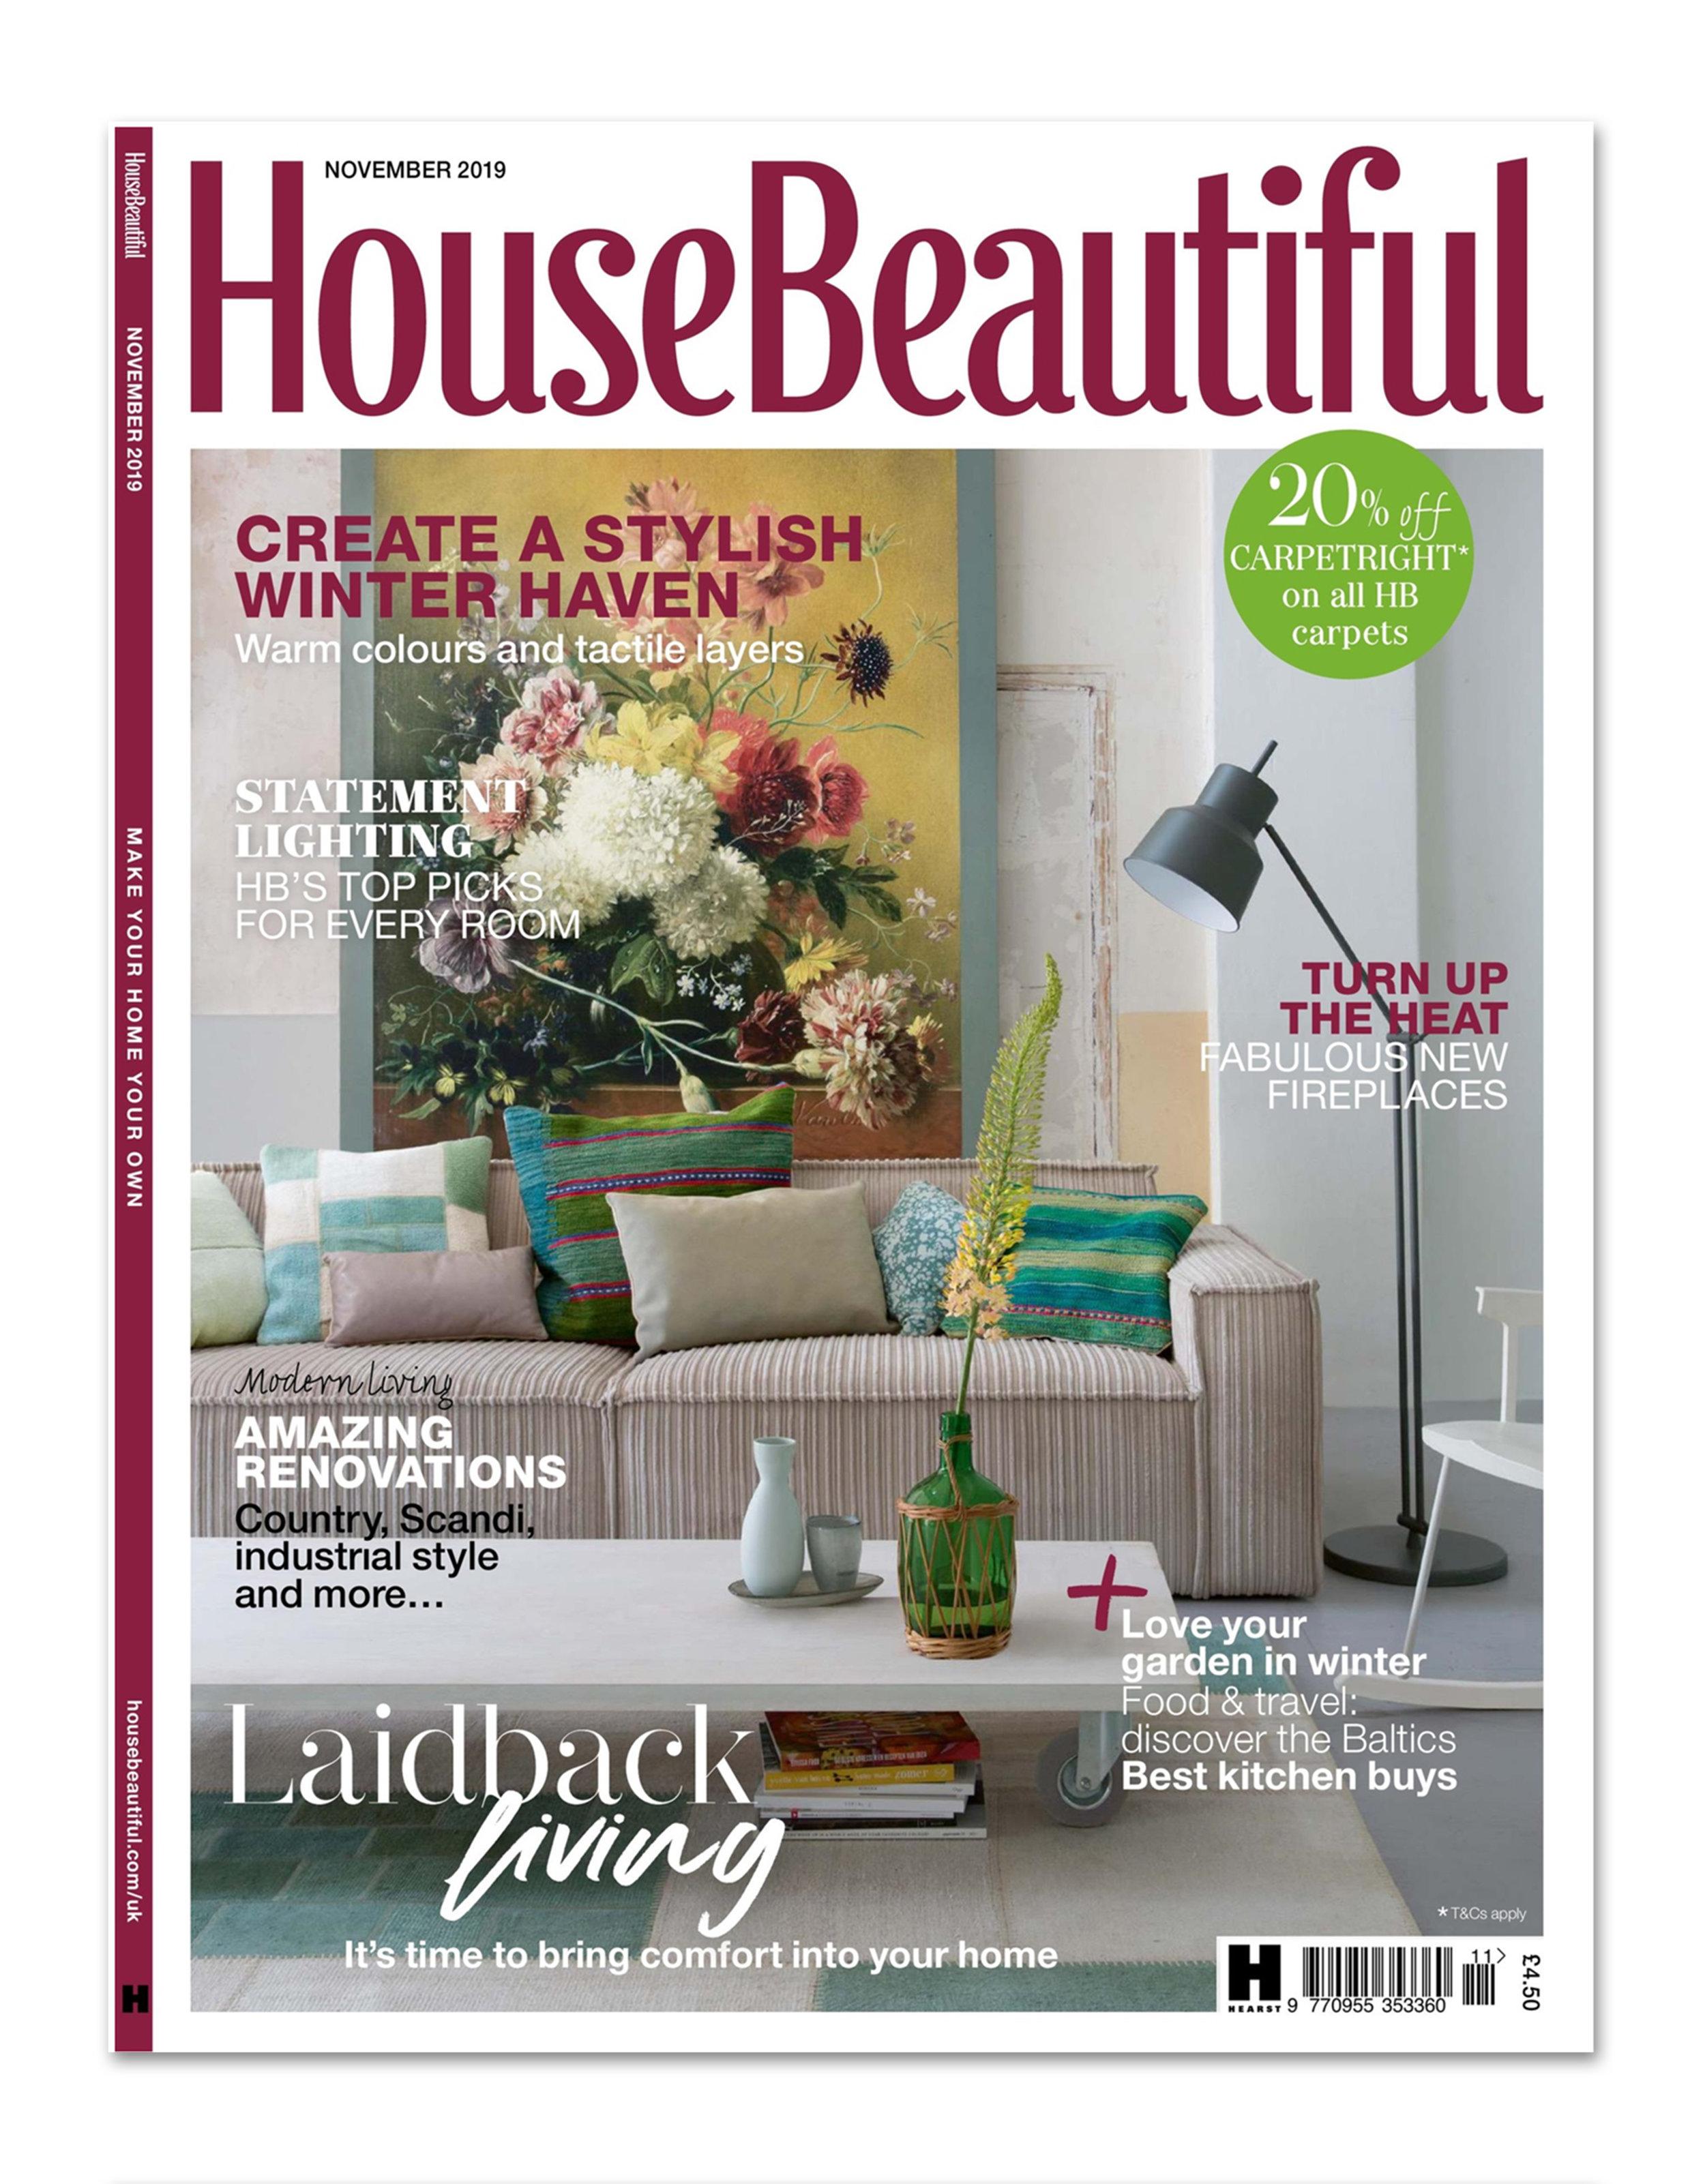 House Beautiful Nov 2019_00 Cover.jpg